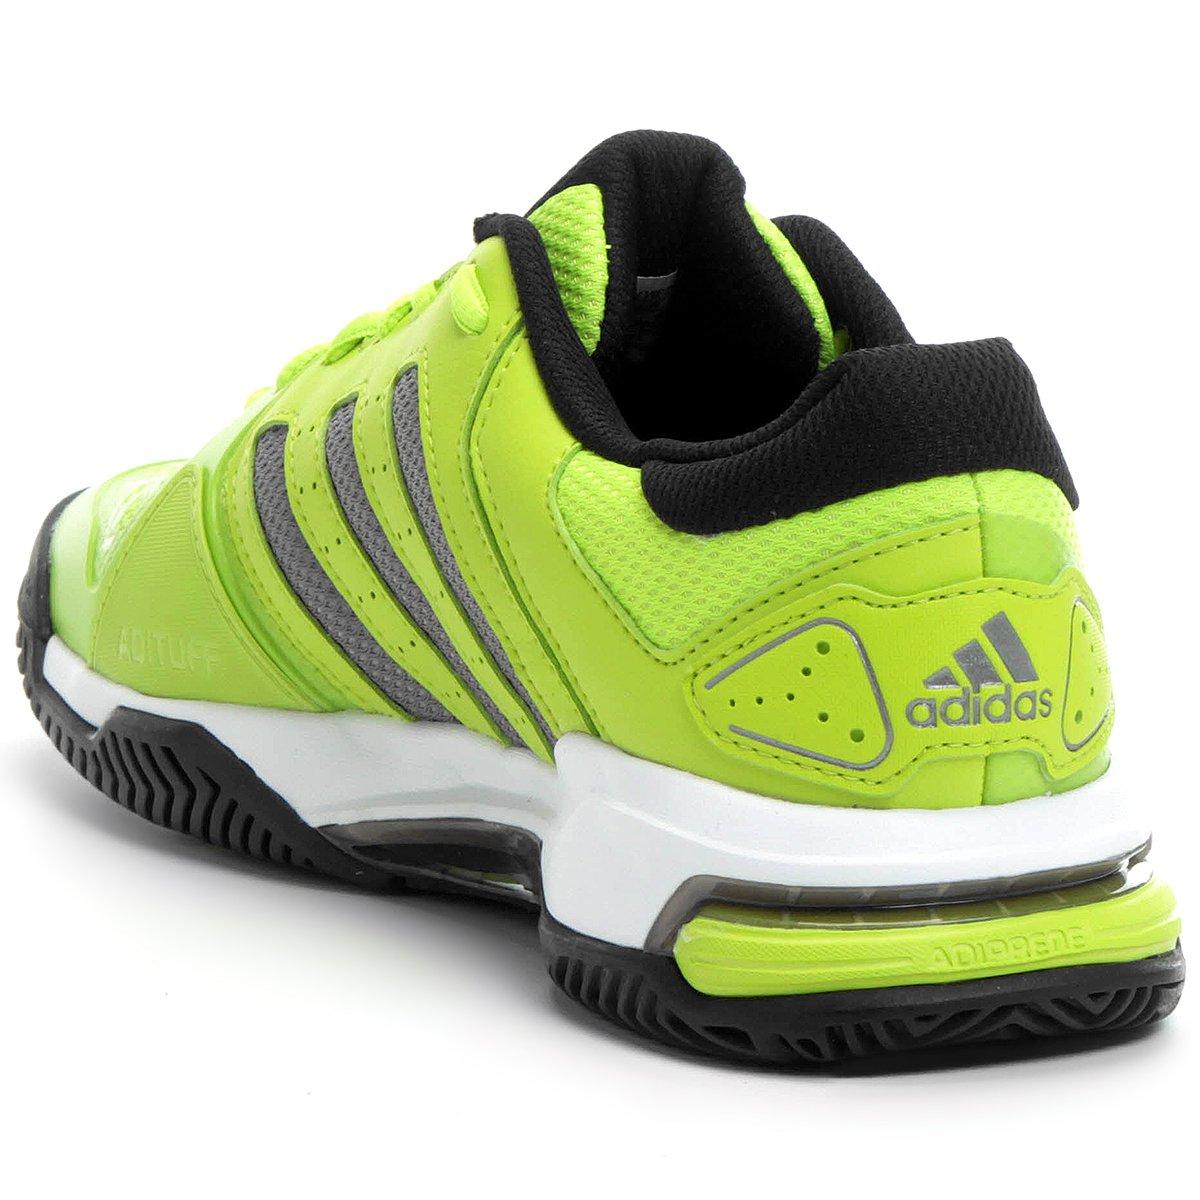 5c672c725a8d9 380ad5f16b1 tênis adidas c oudfoam pure feminino comprar no shopfáci ...